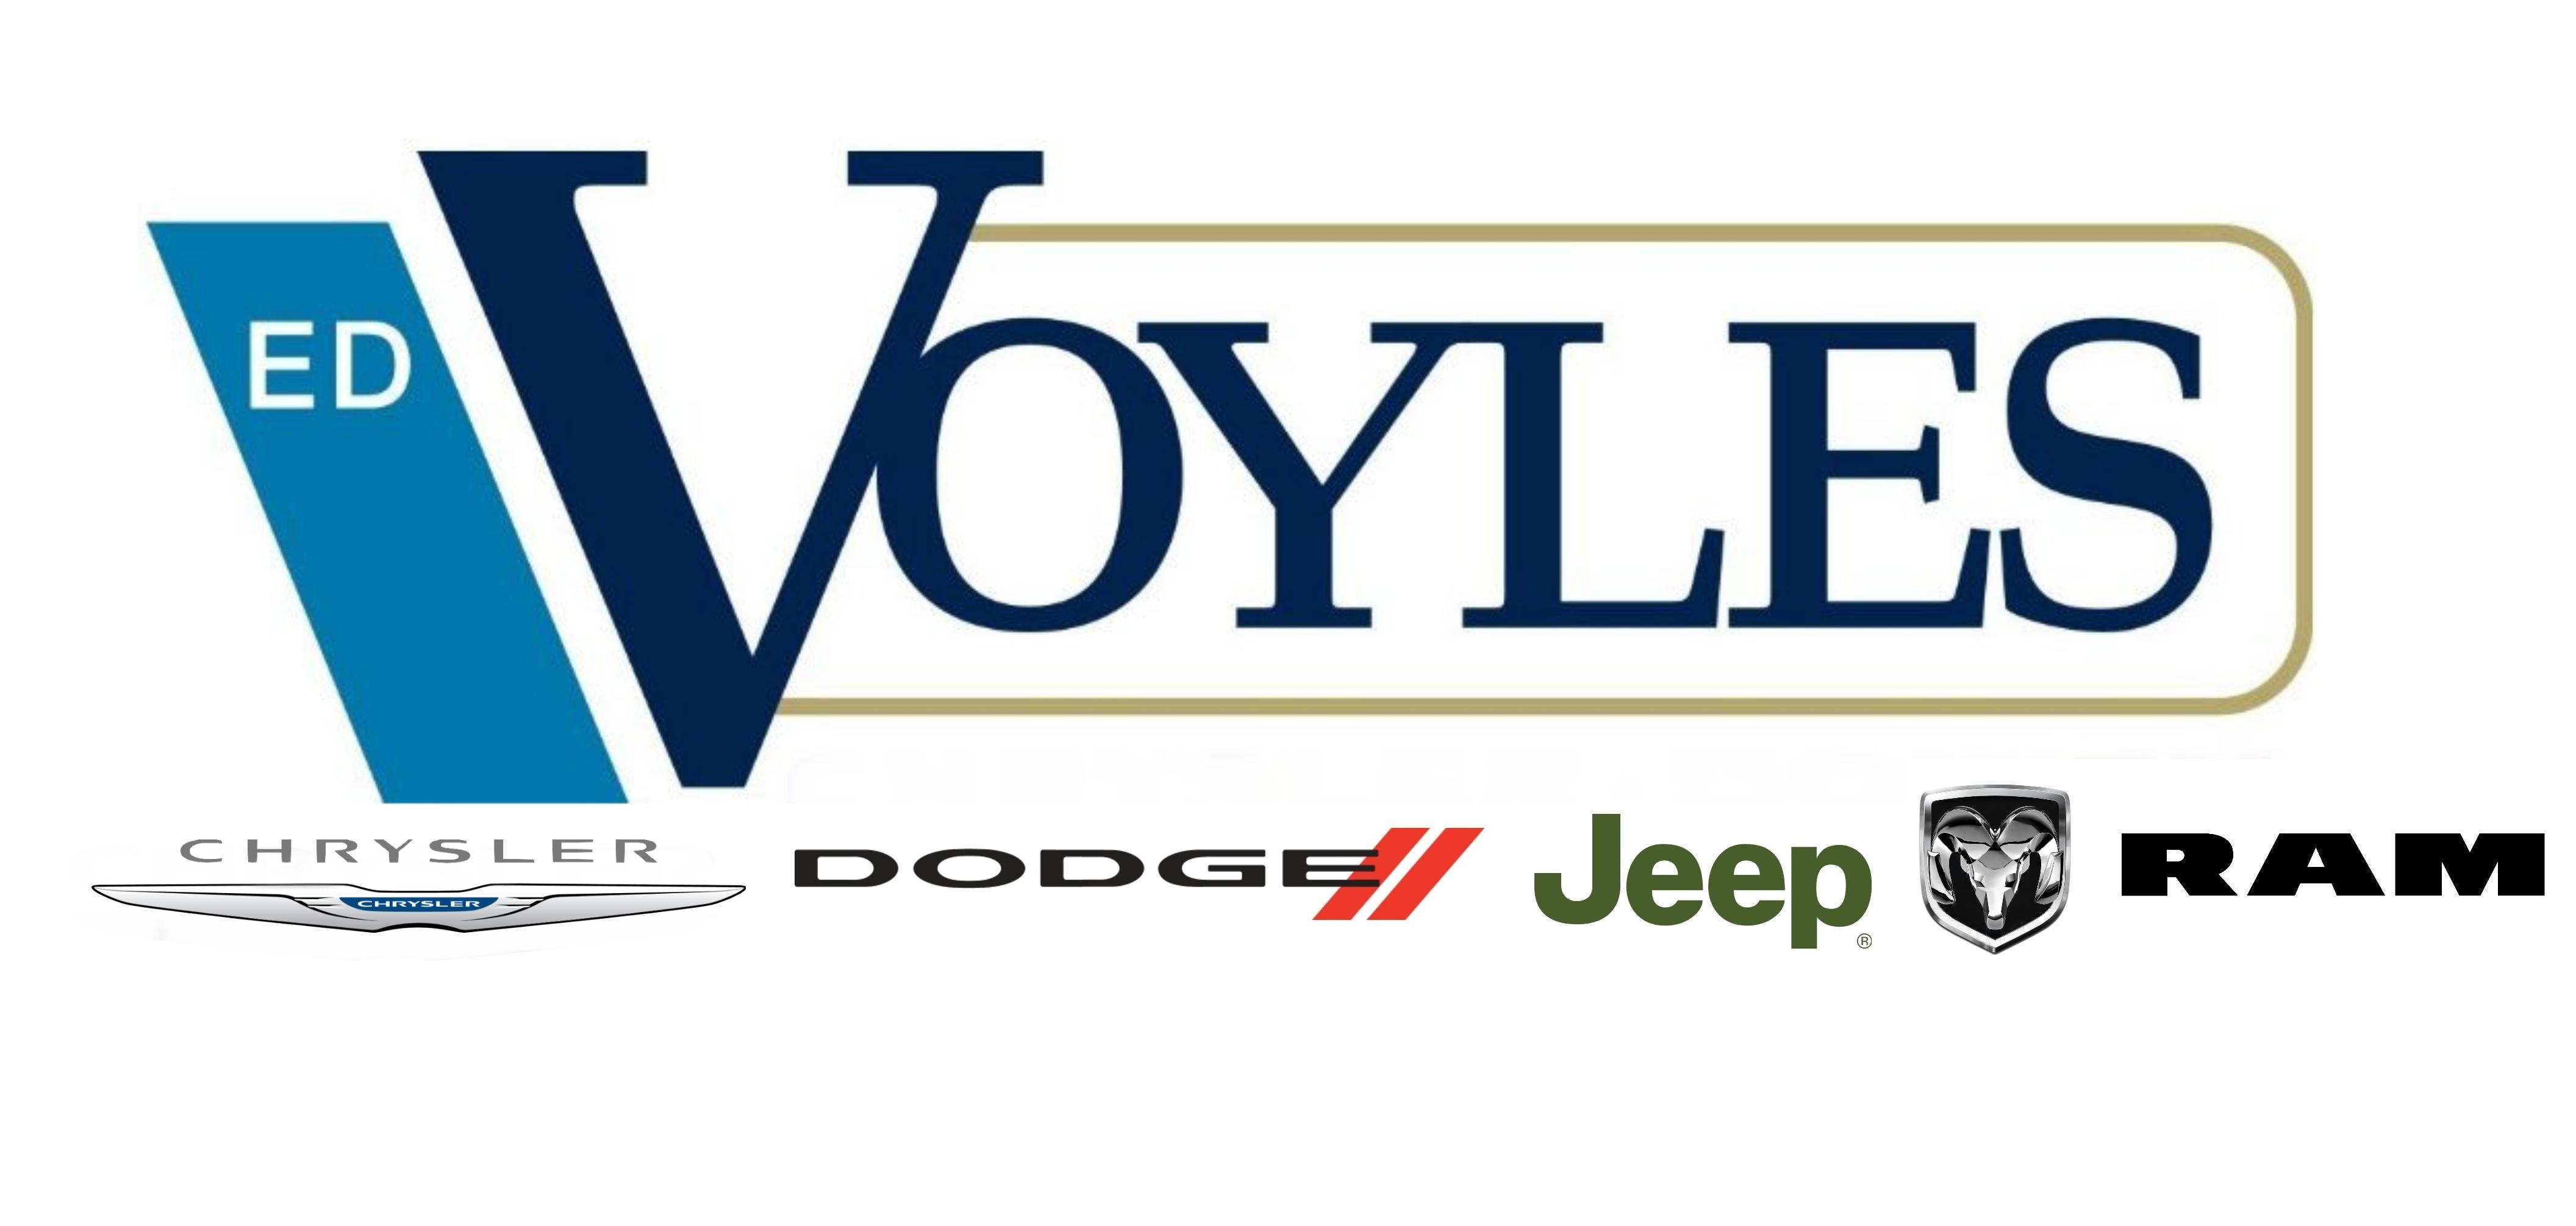 Ed Voyles Jeep Raffle | The Marietta Band